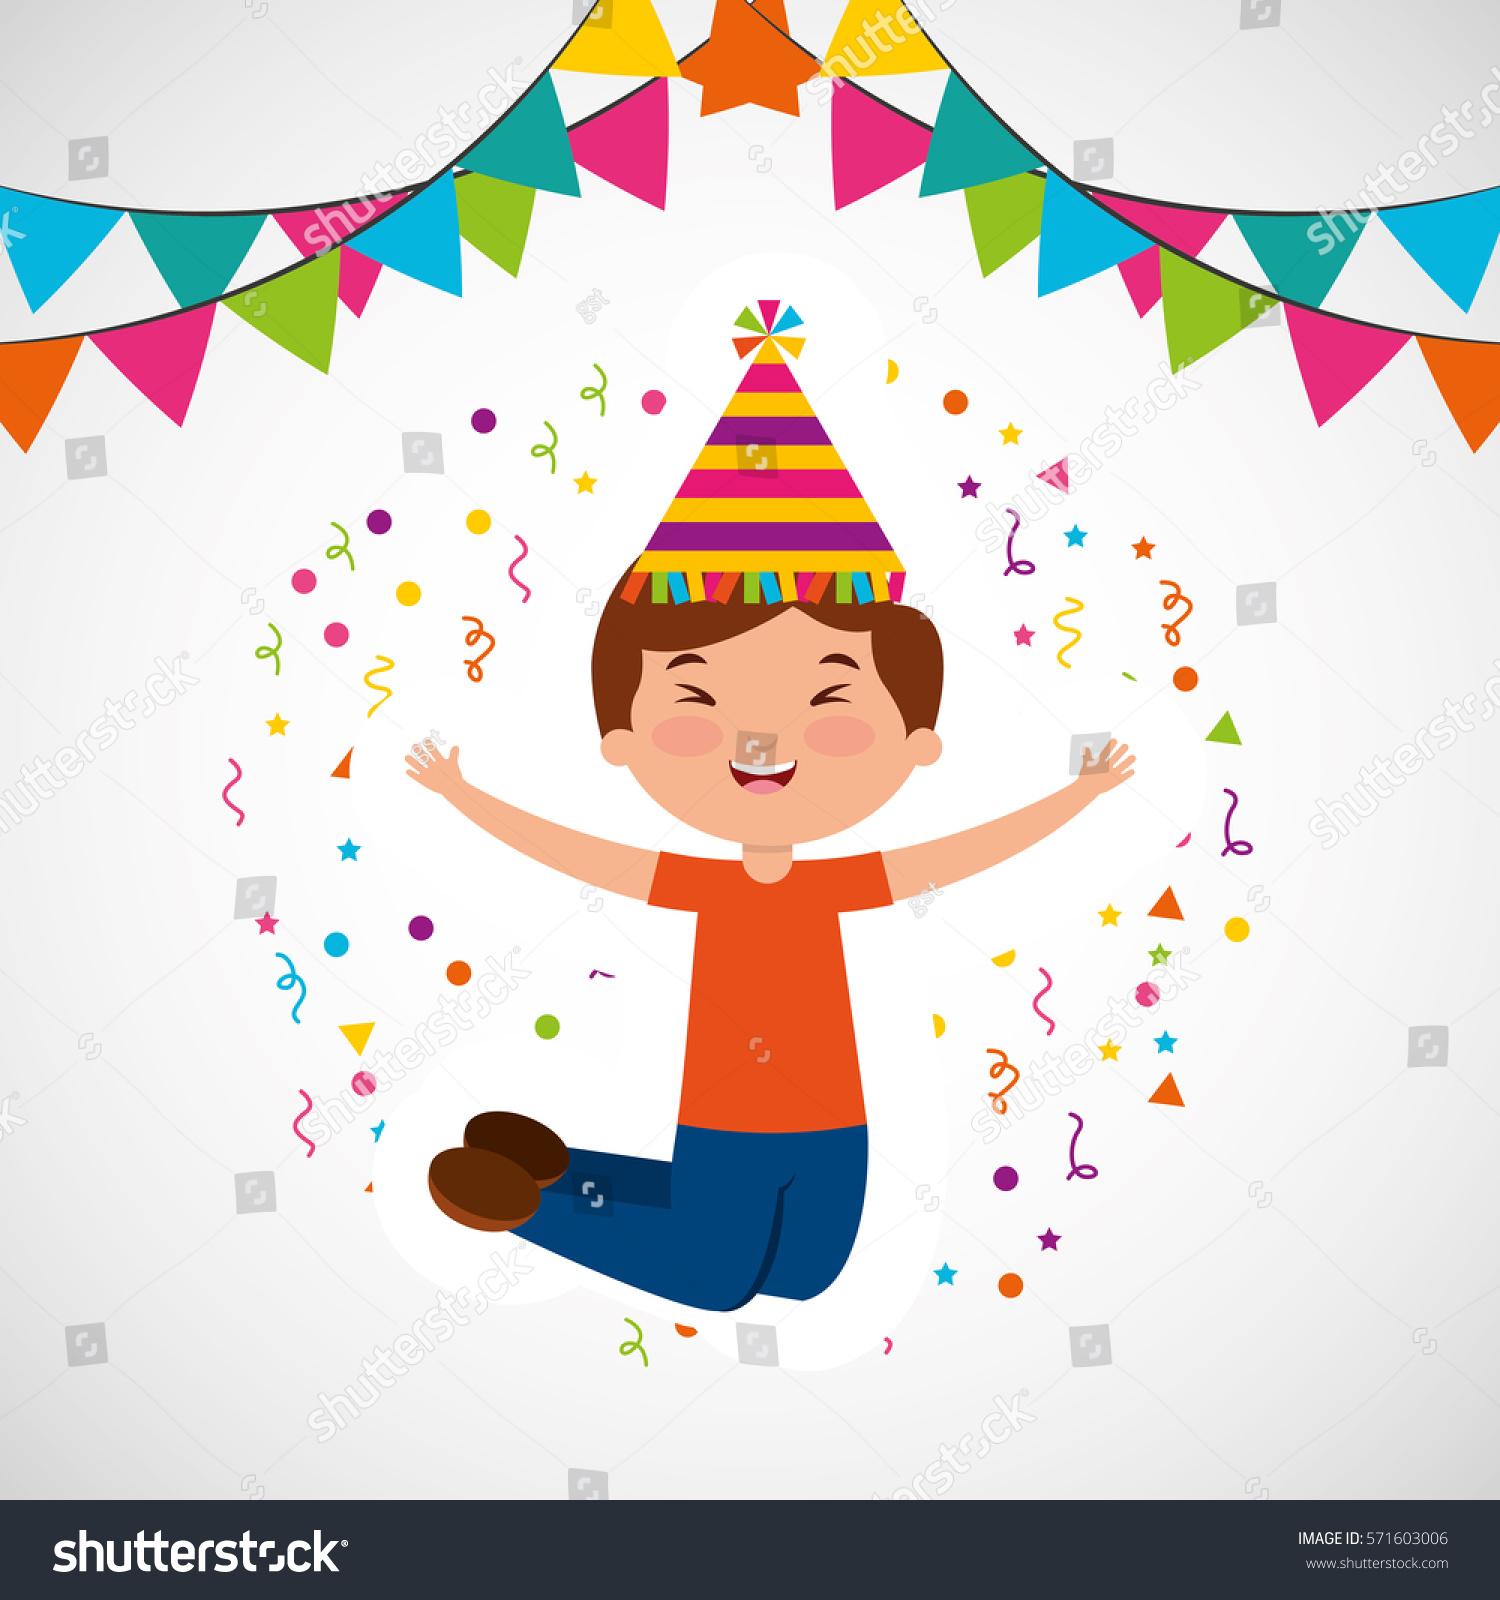 Happy Birthday Celebration Card With Kid Vector Illustration Design